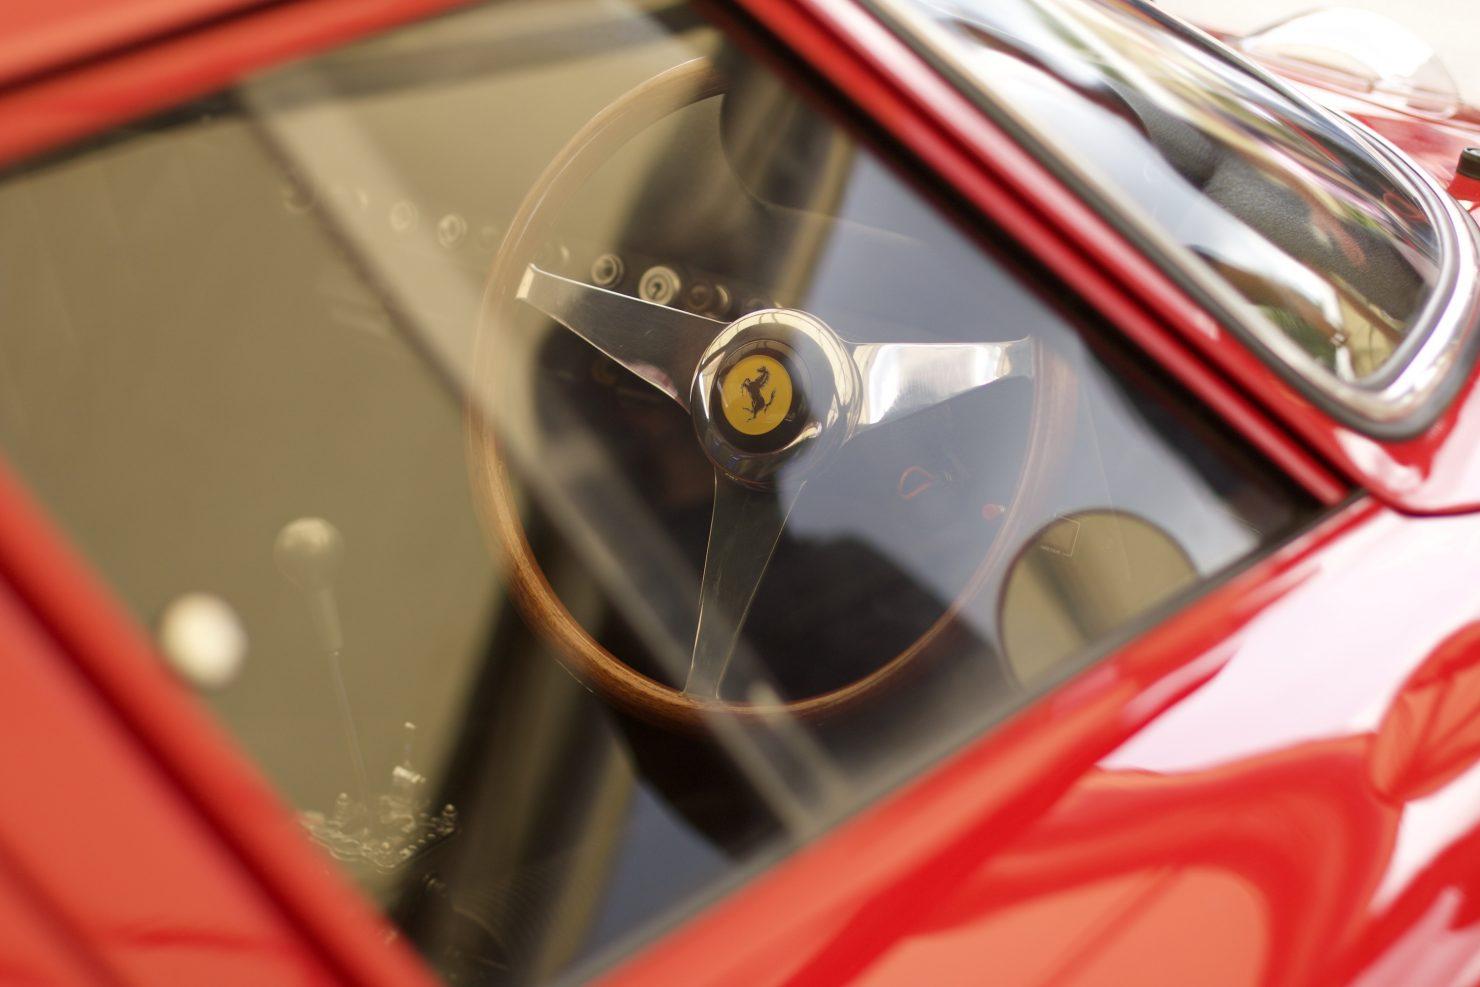 1964 Ferrari 250 LM 1480x987 - Cockpits of Goodwood